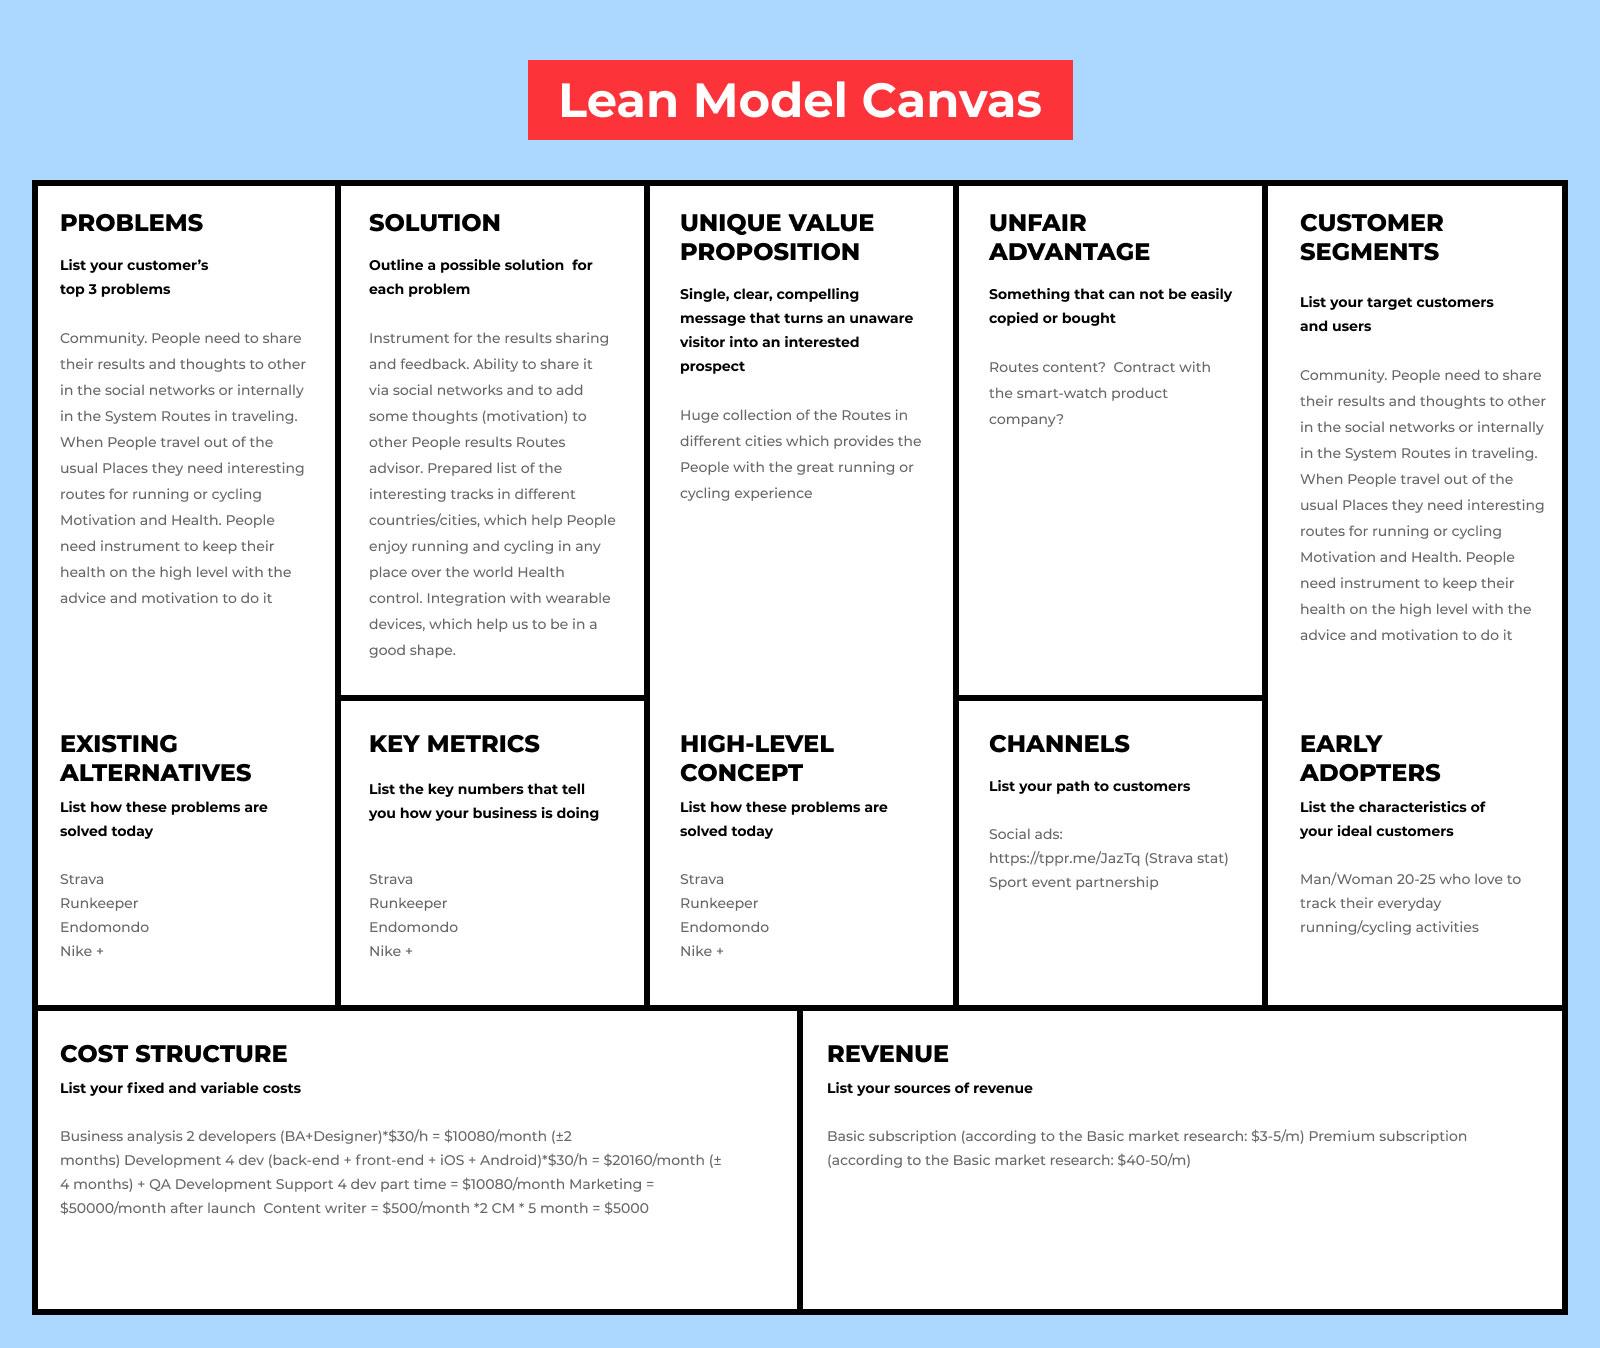 Lean Model Canvas for mobile app